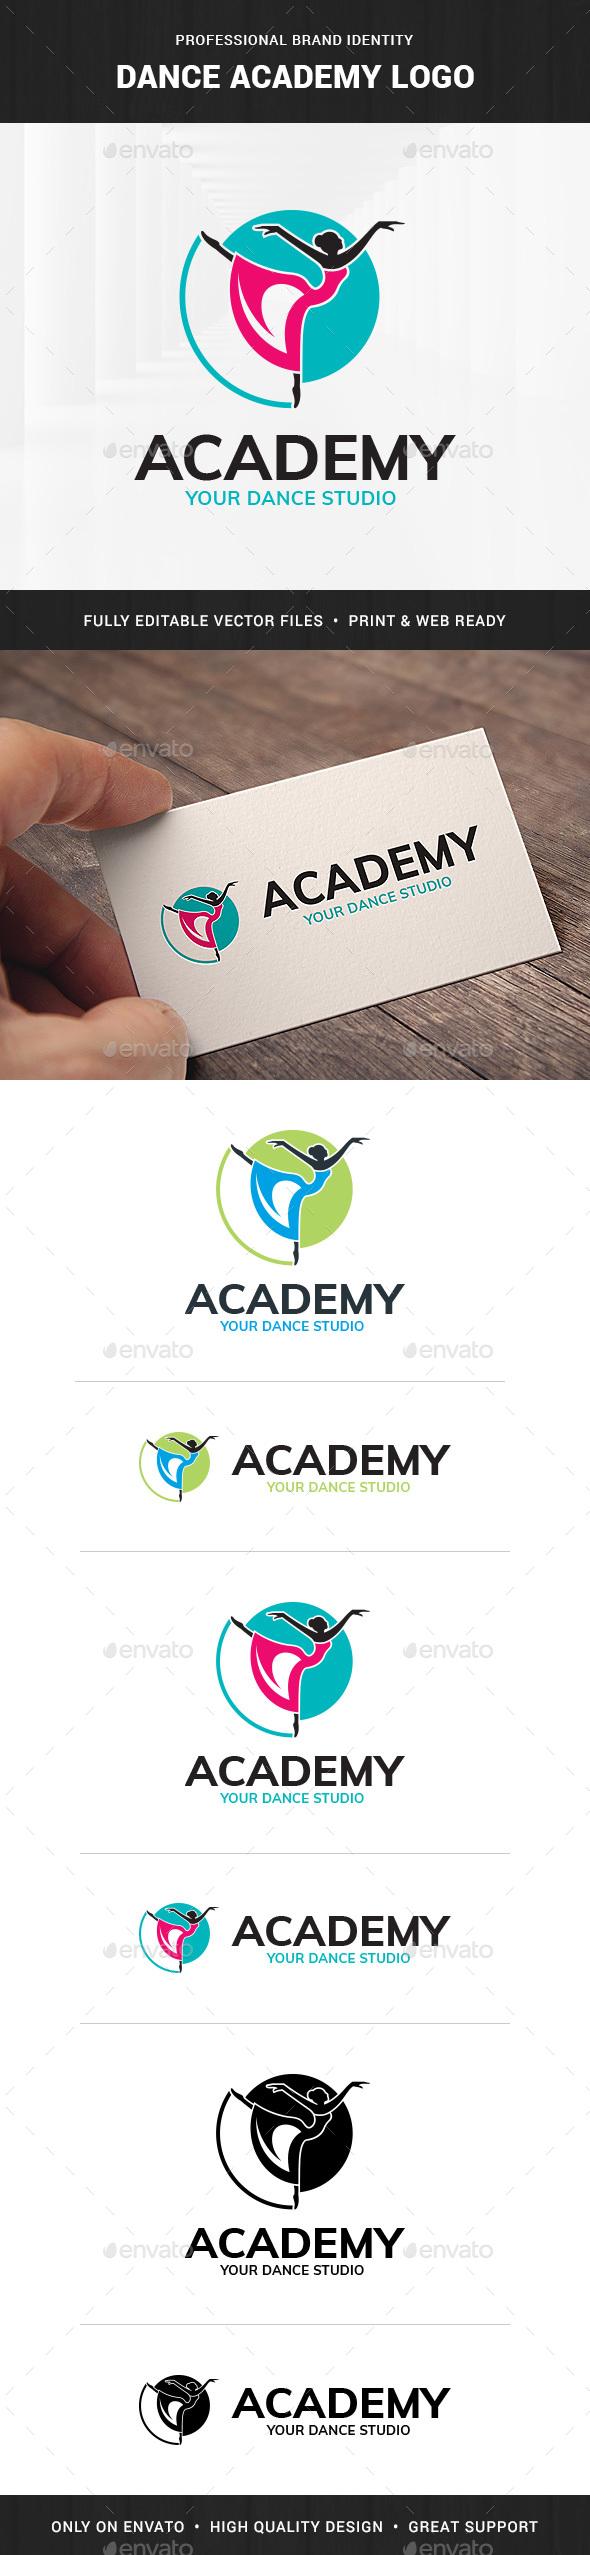 Dance Academy Logo Template